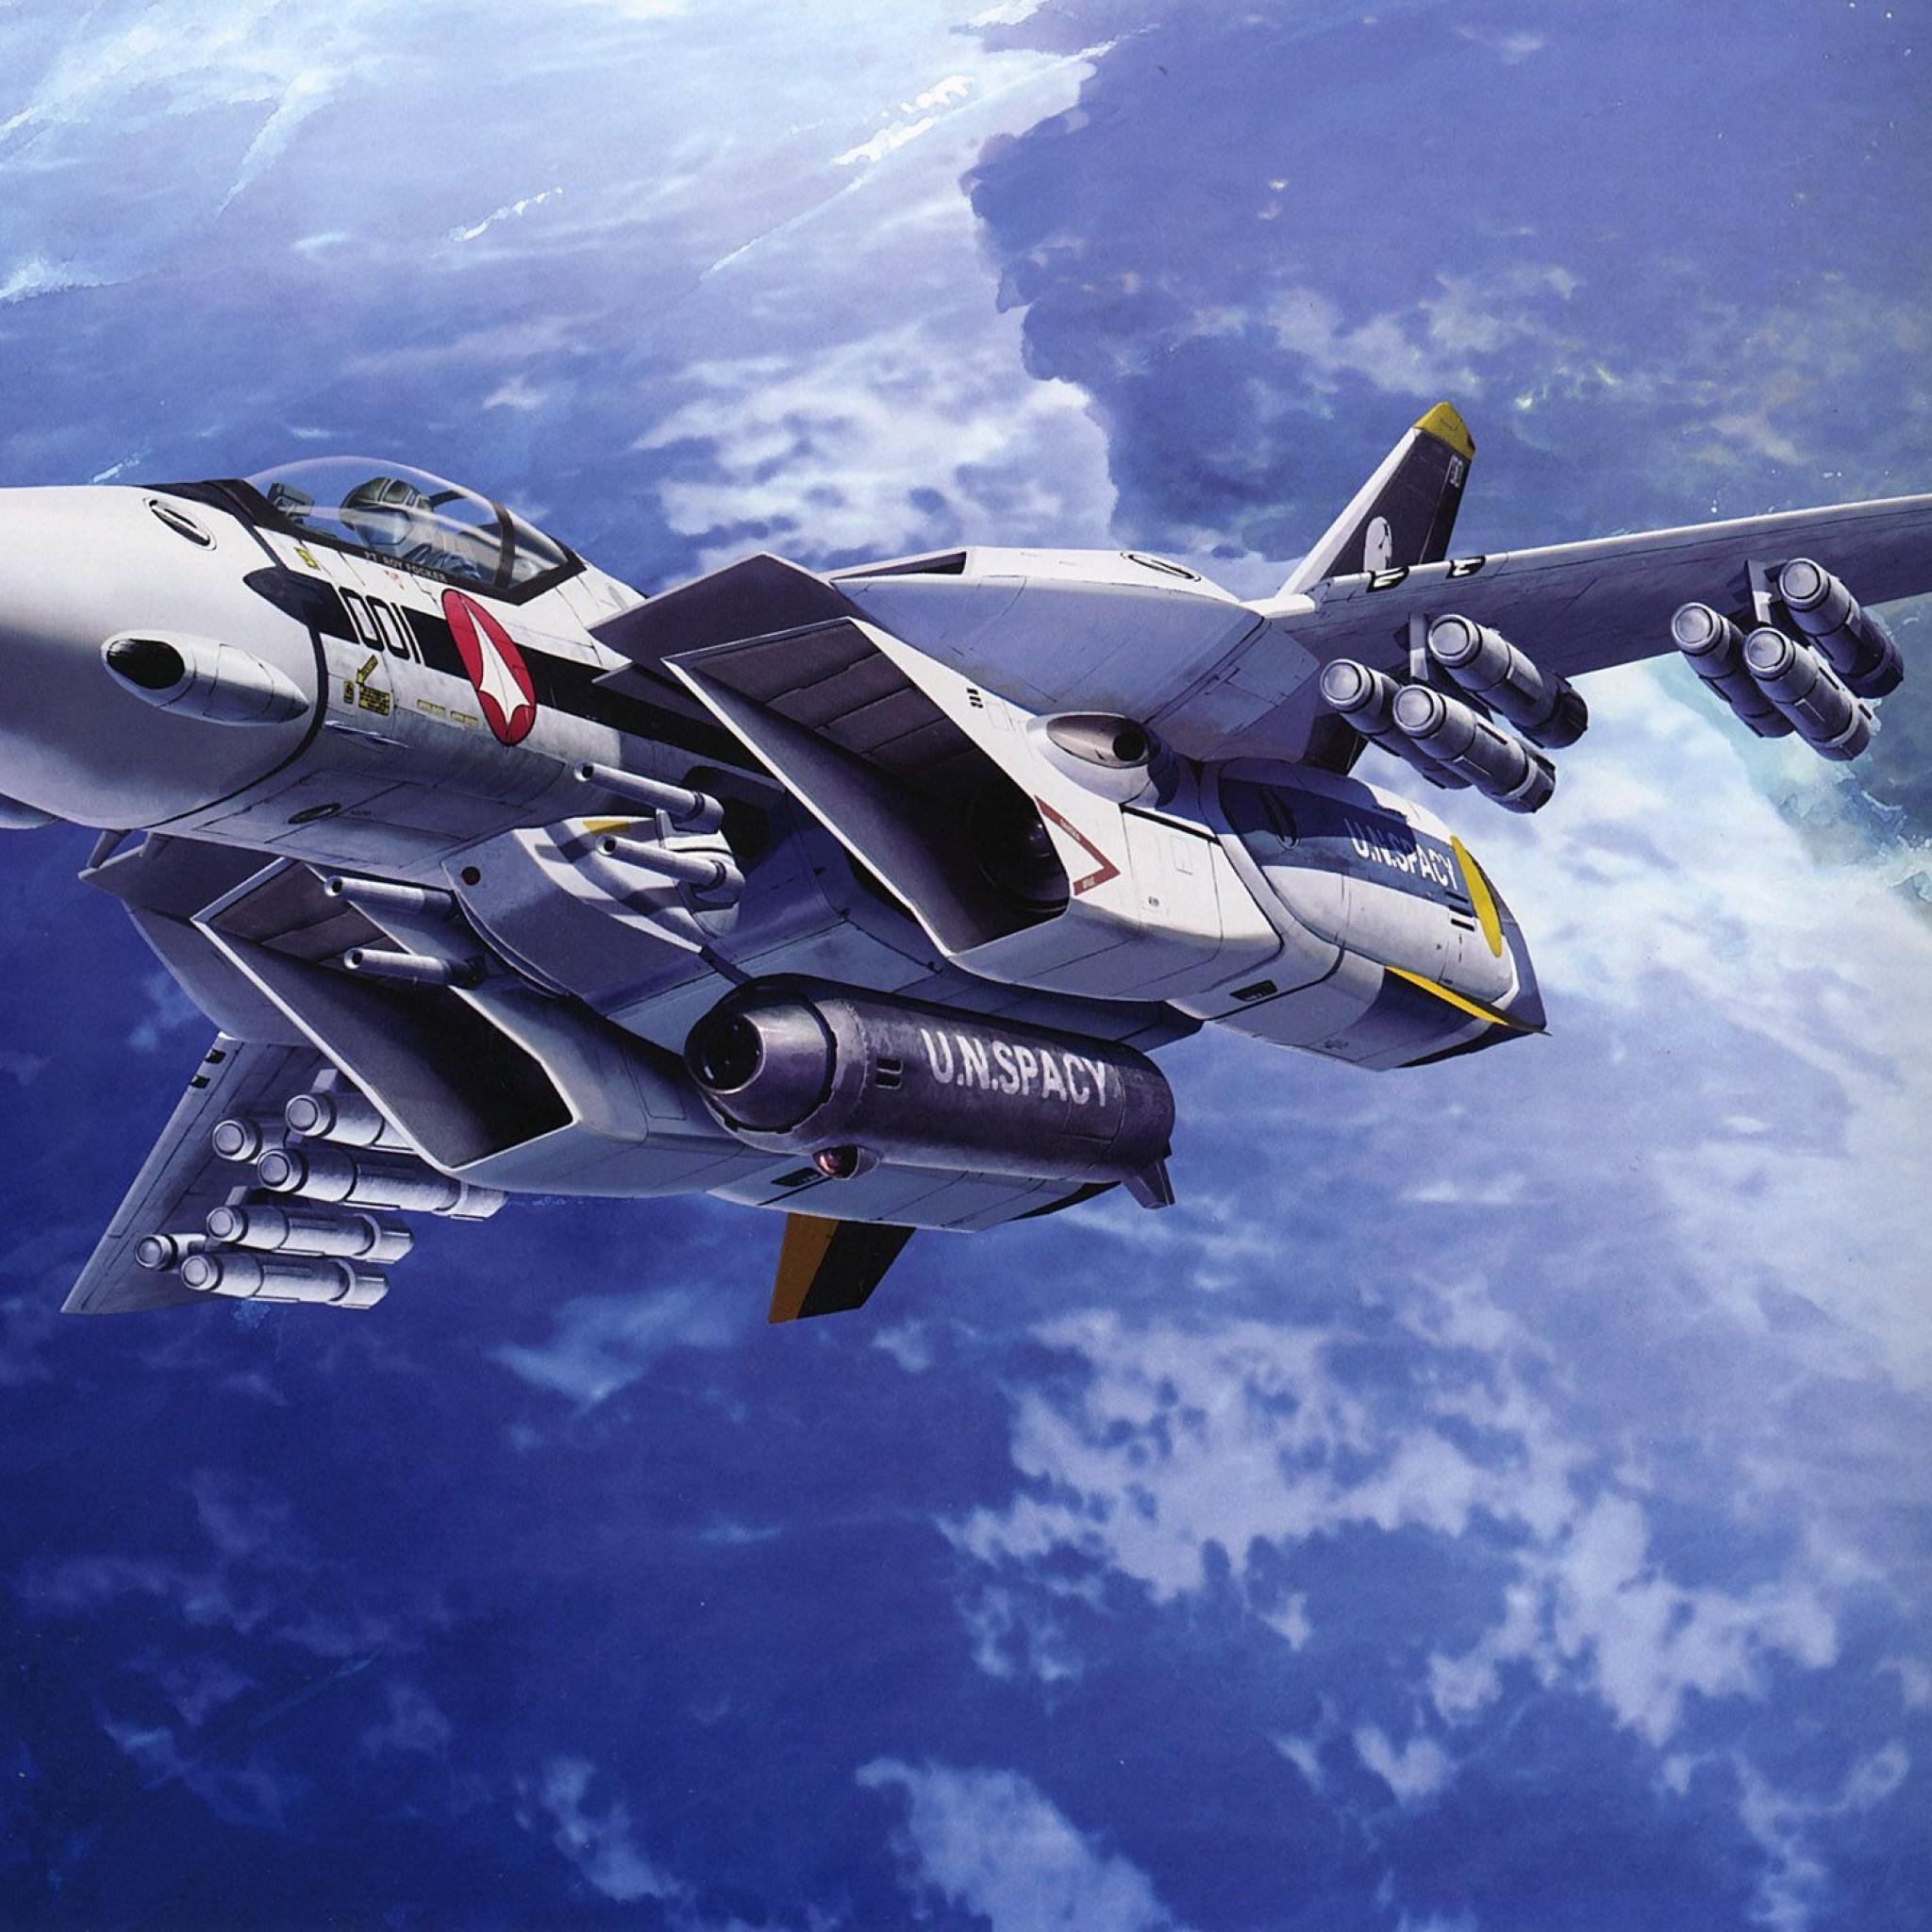 Iphone X Hd Wallpaper Aircraft 絵画、航空機、マクロス、芸術、海軍、飛行機、ジェット機 無料壁紙高画質 Ipad